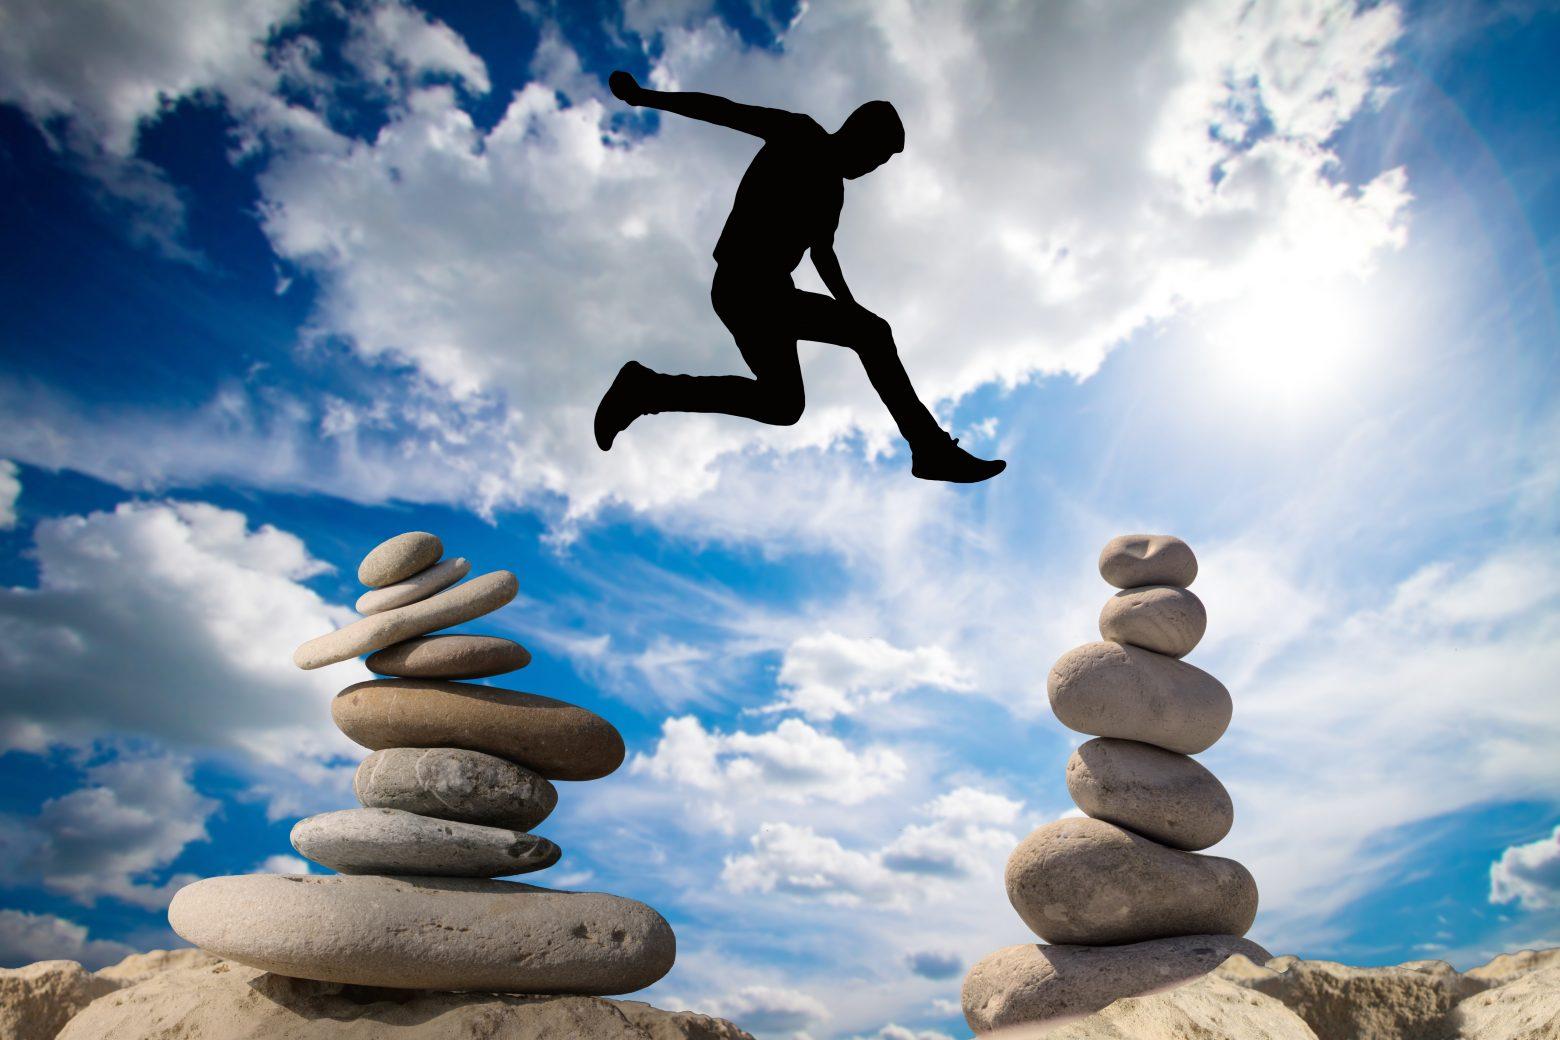 Balance Risk Courage Risky High Spirits Rock Sky – Clean Public Domain